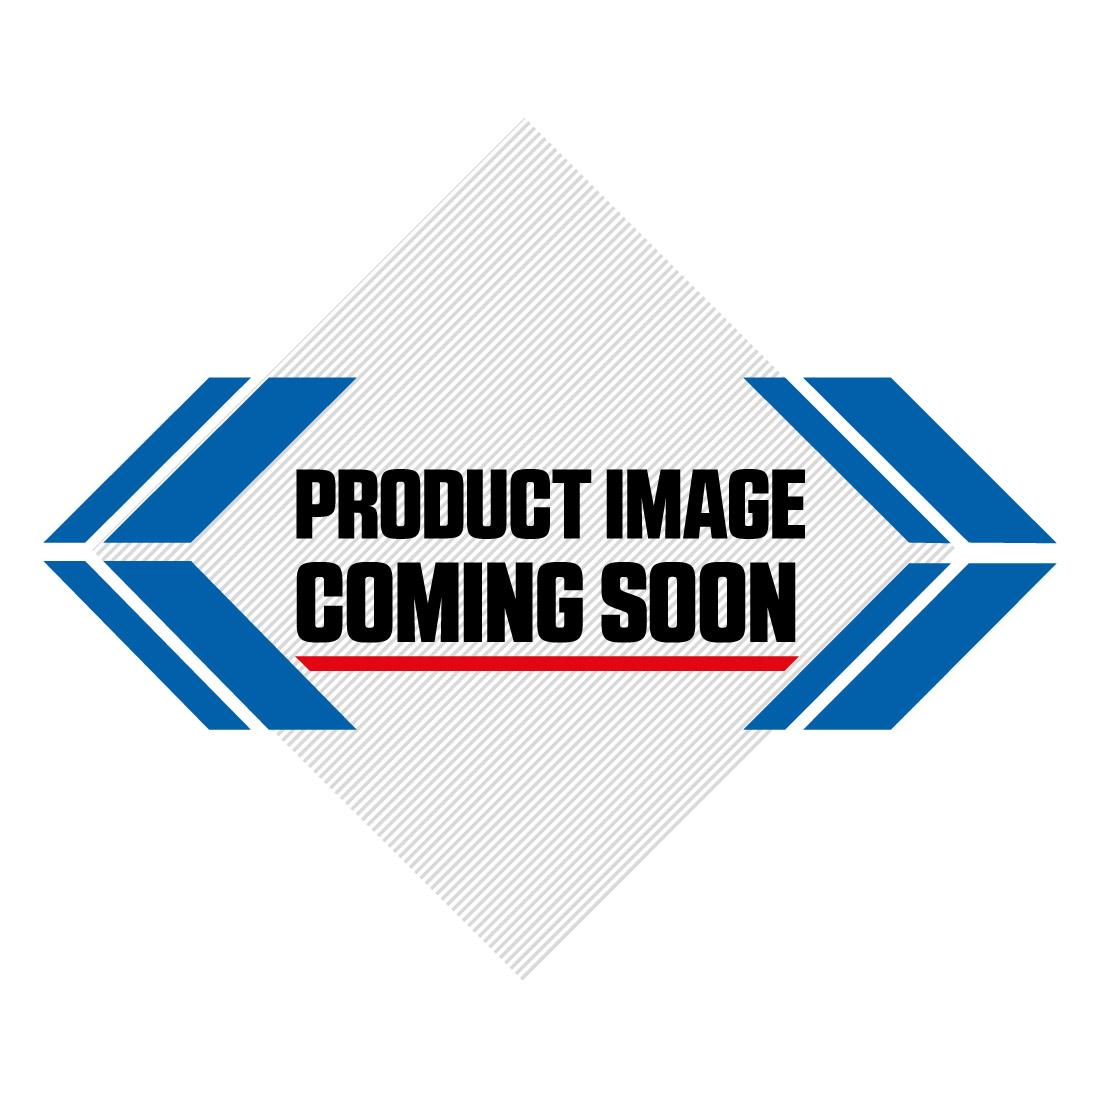 Suzuki Restyled Plastic Kit Suzuki RM 85 (00-17) Black Image-4>